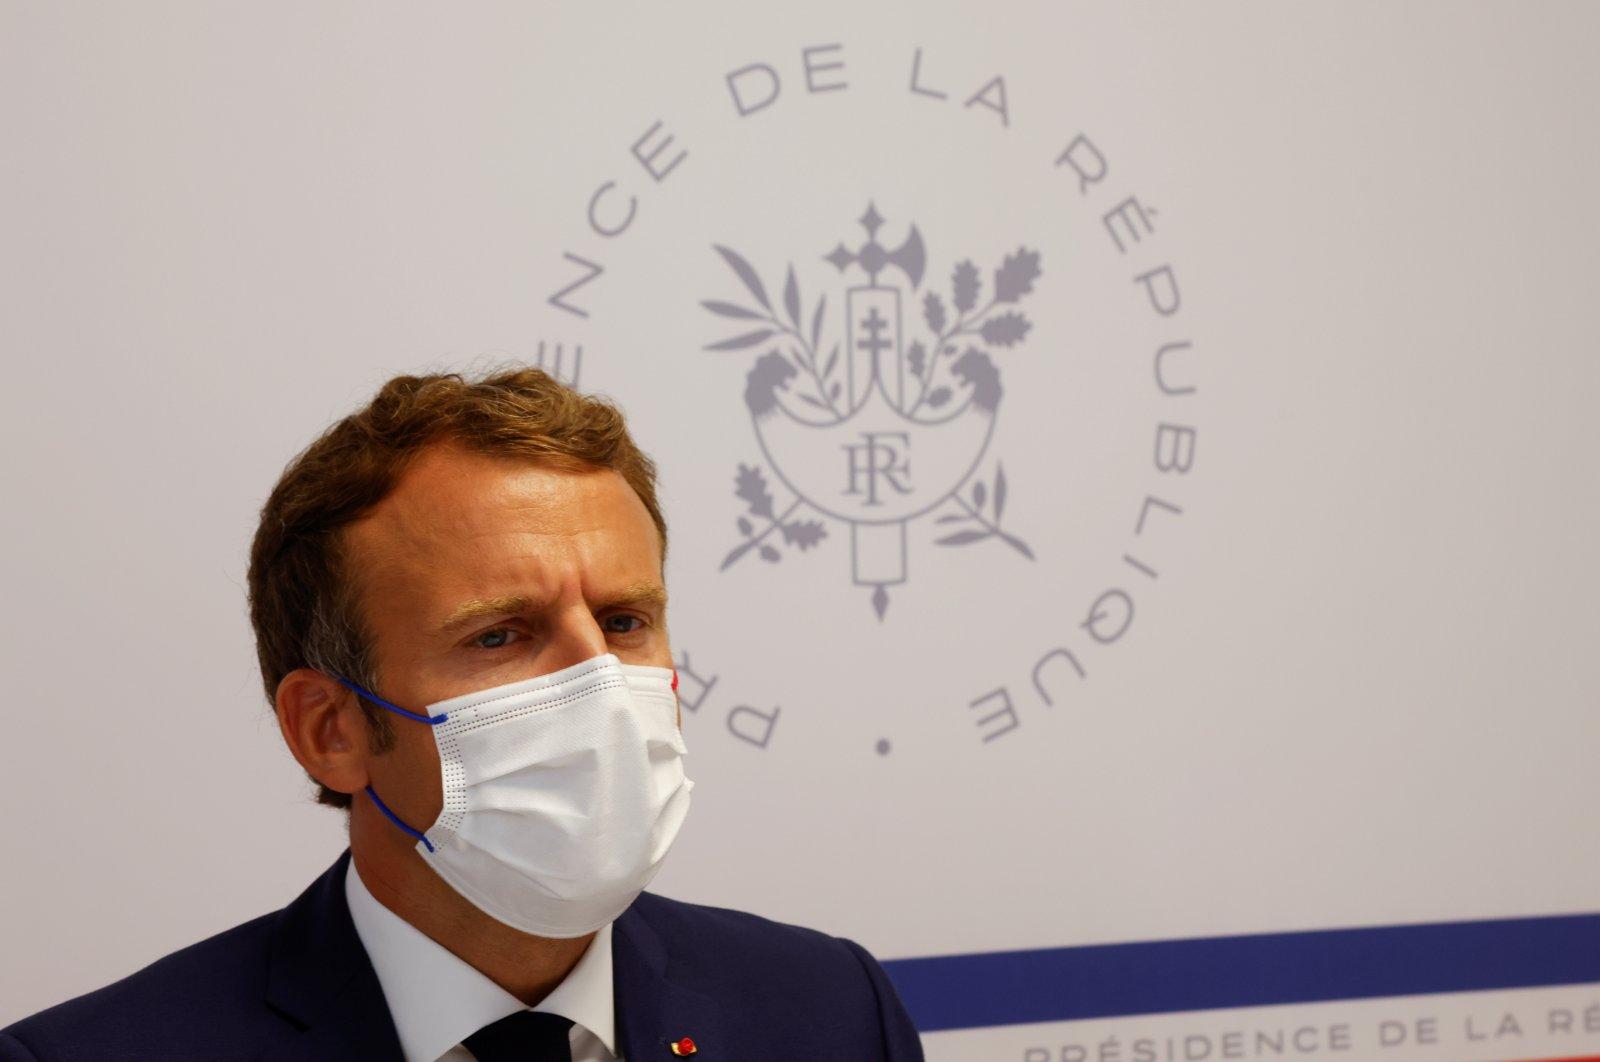 French President Emmanuel Macron attends a Defense Council meeting at Fort de Bregancon in Bormes-les-Mimosas, France, Aug. 11, 2021. (EPA Photo)